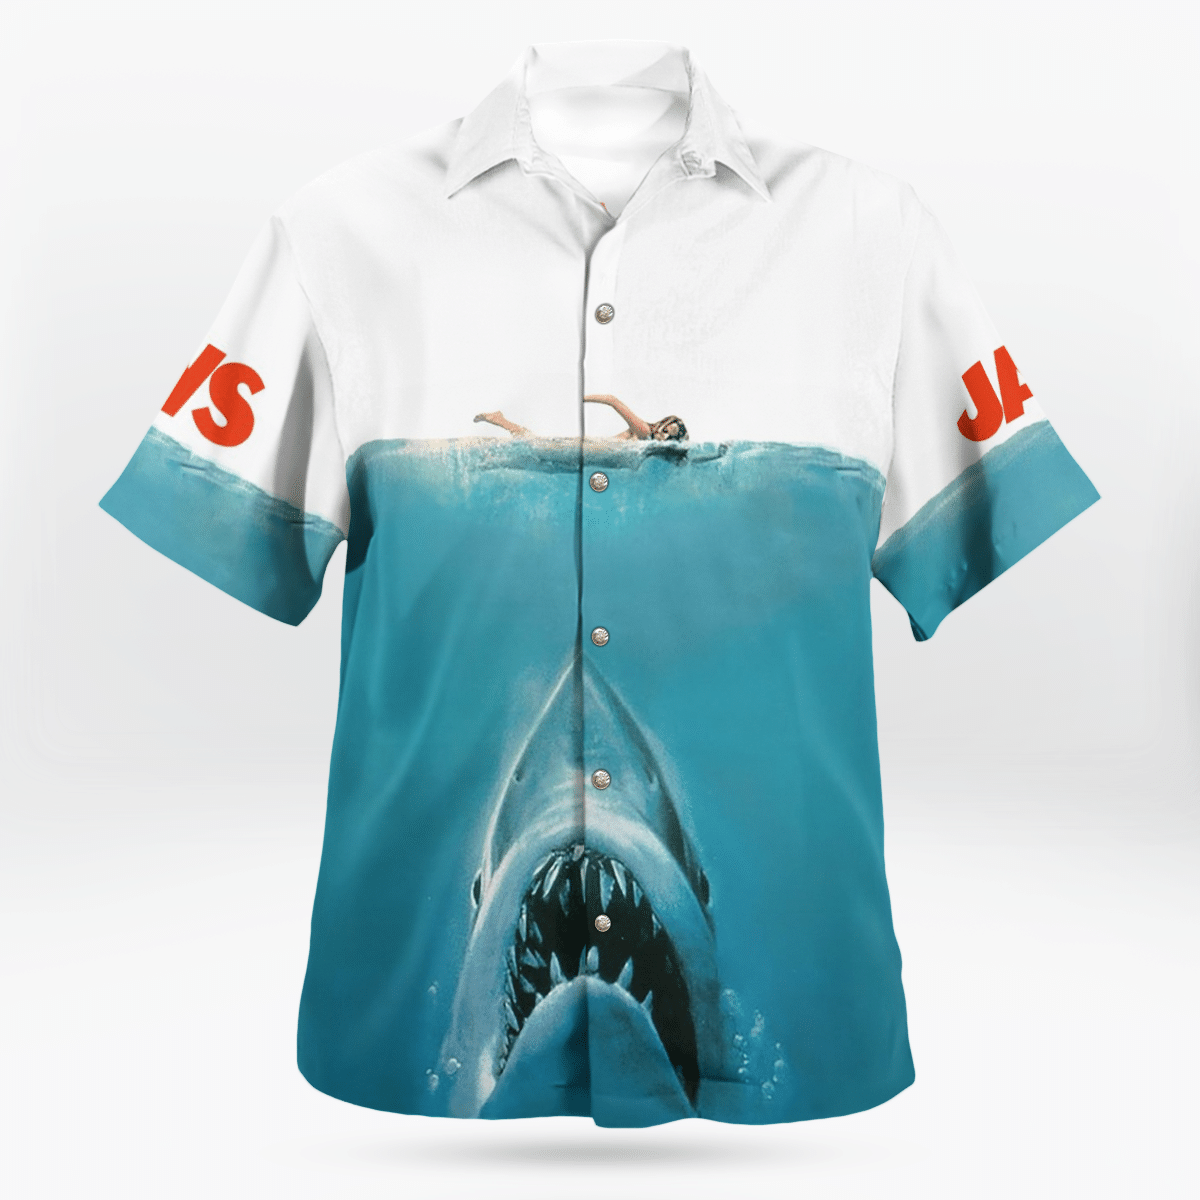 Jaws thriller film shark ocean Hawaiian Shirt and Short